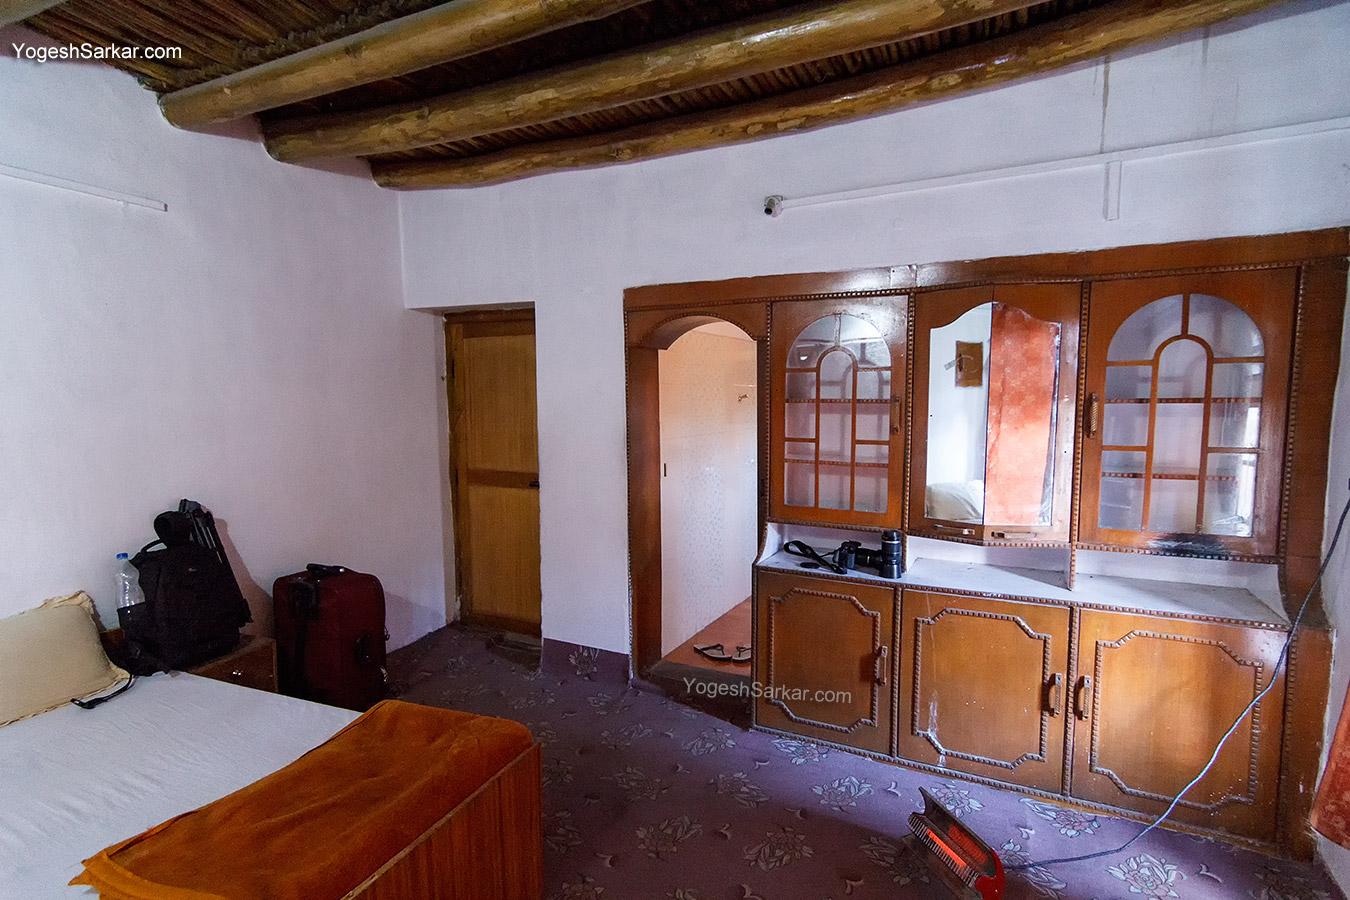 habib-guest-house-room-2.jpg